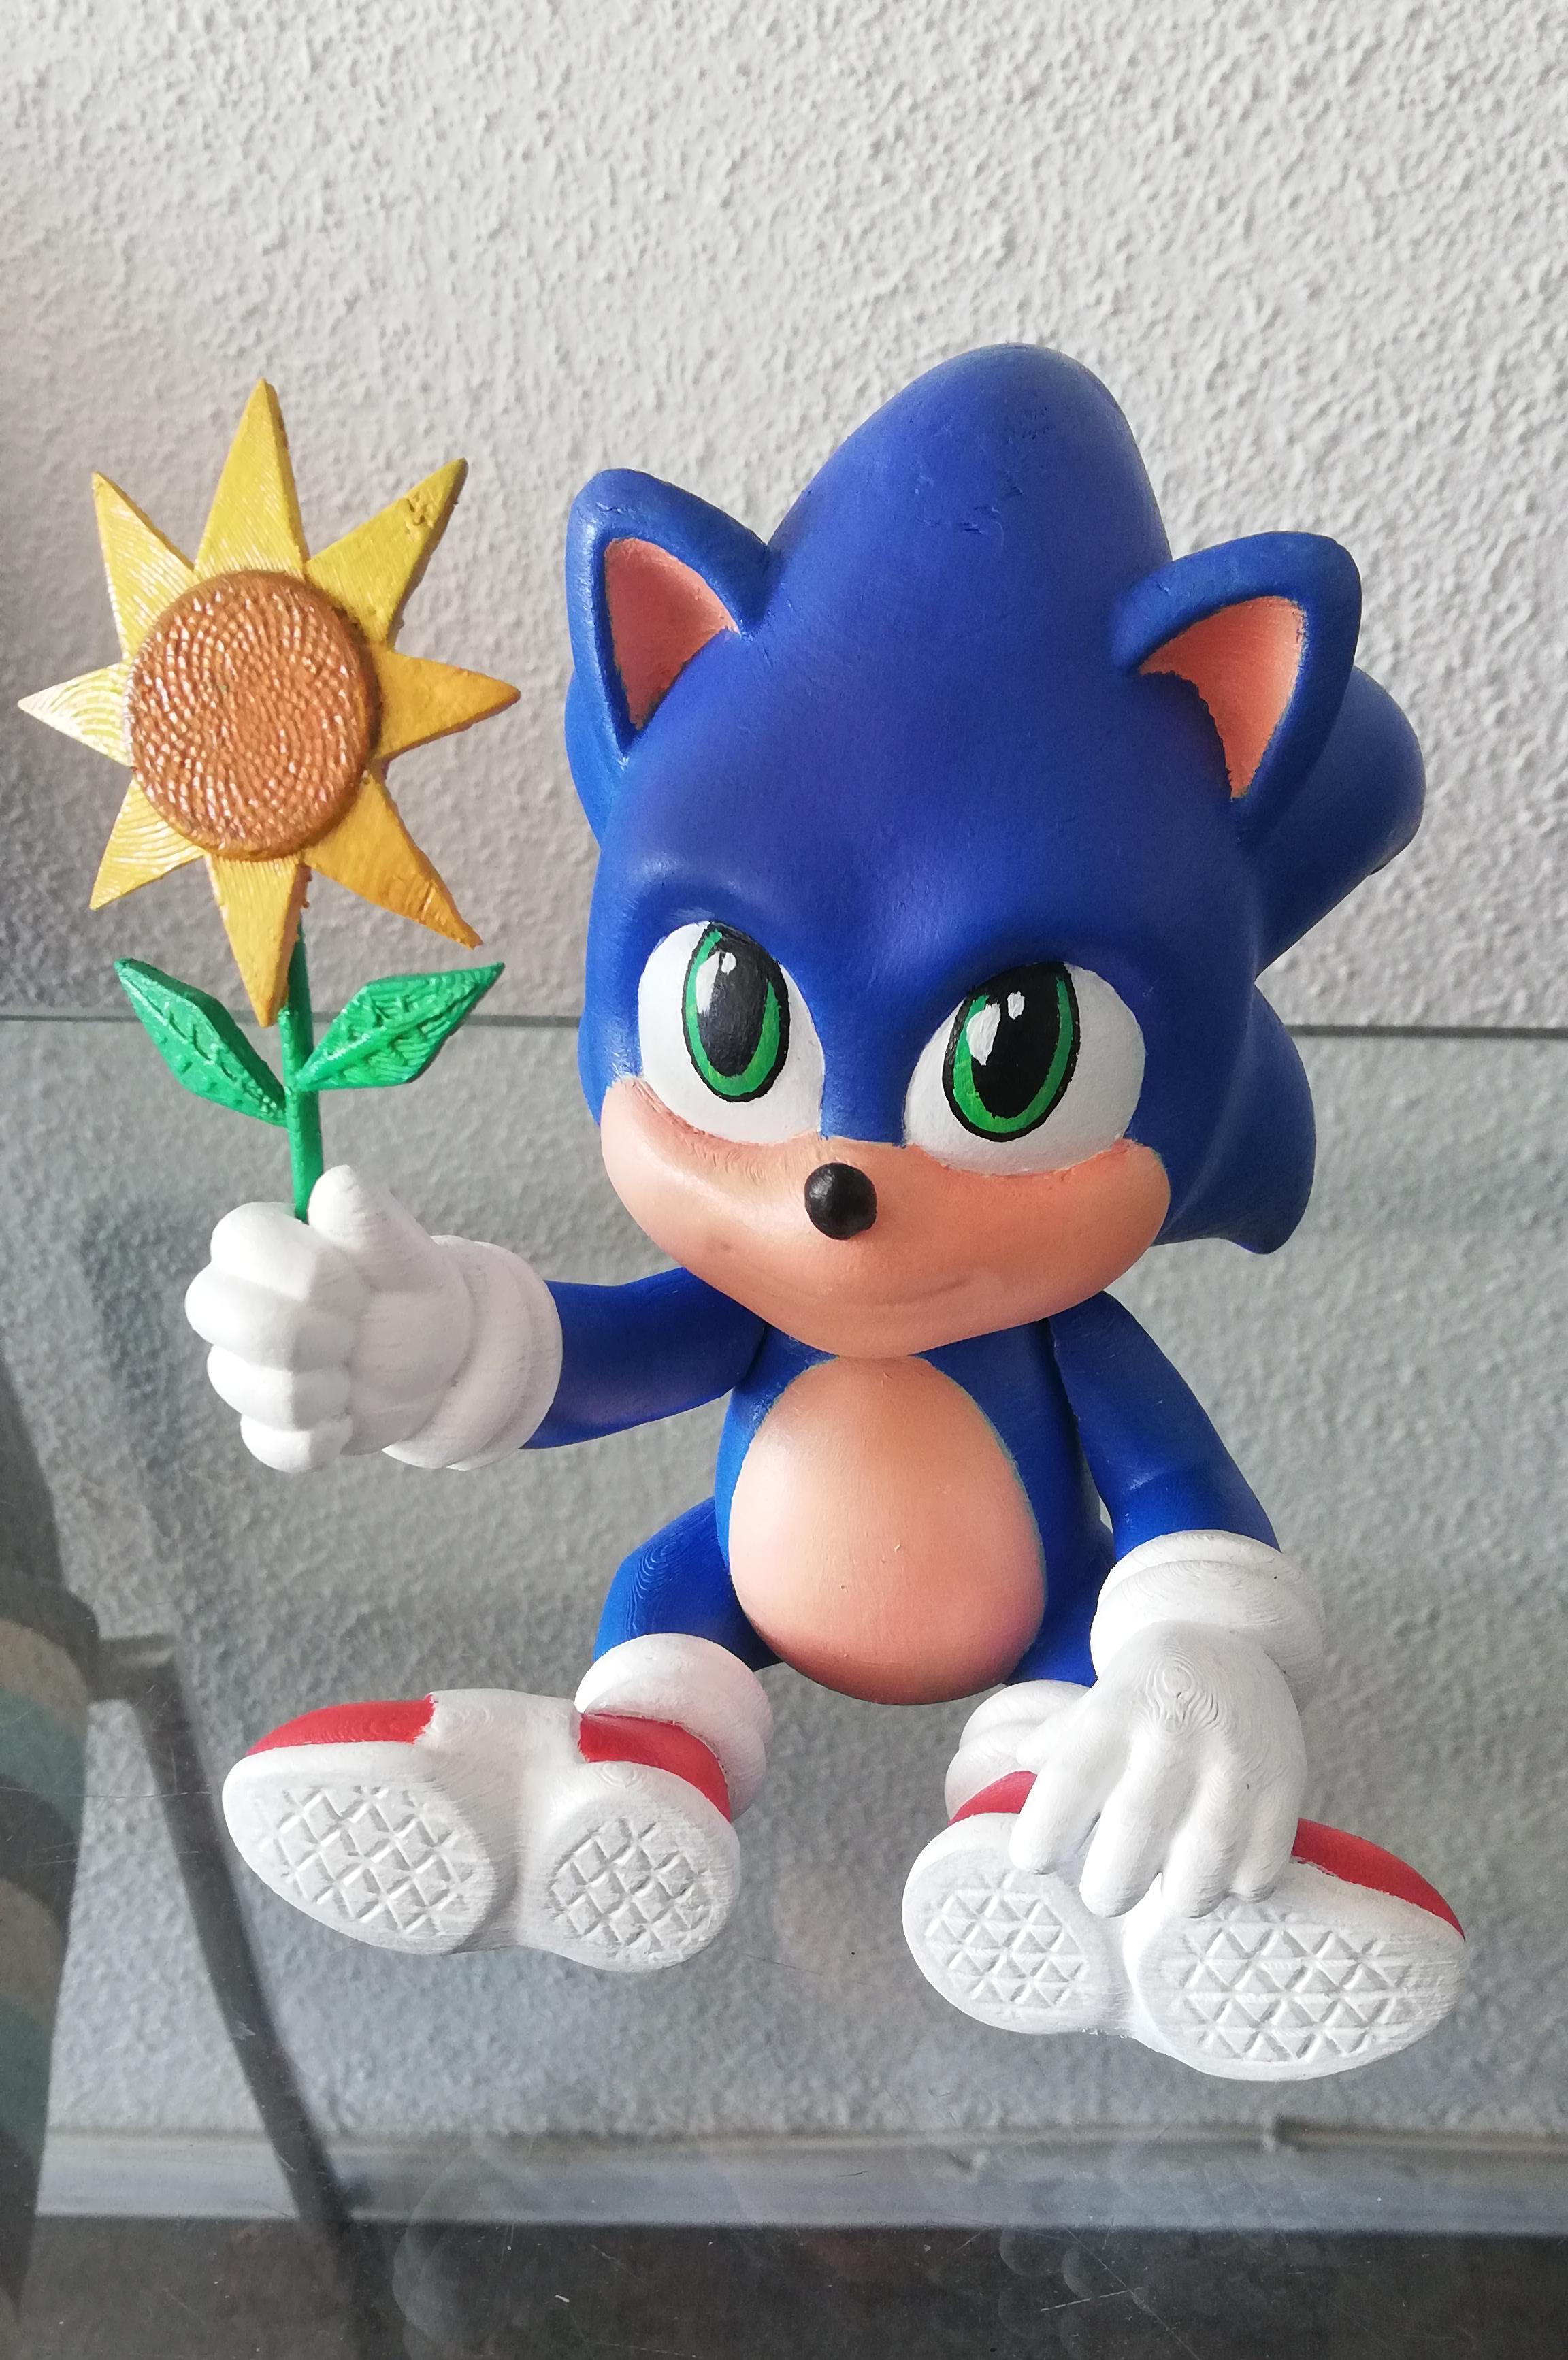 Download 3d Printing Models Baby Sonic The Hedgehog 3d Fanart Cults